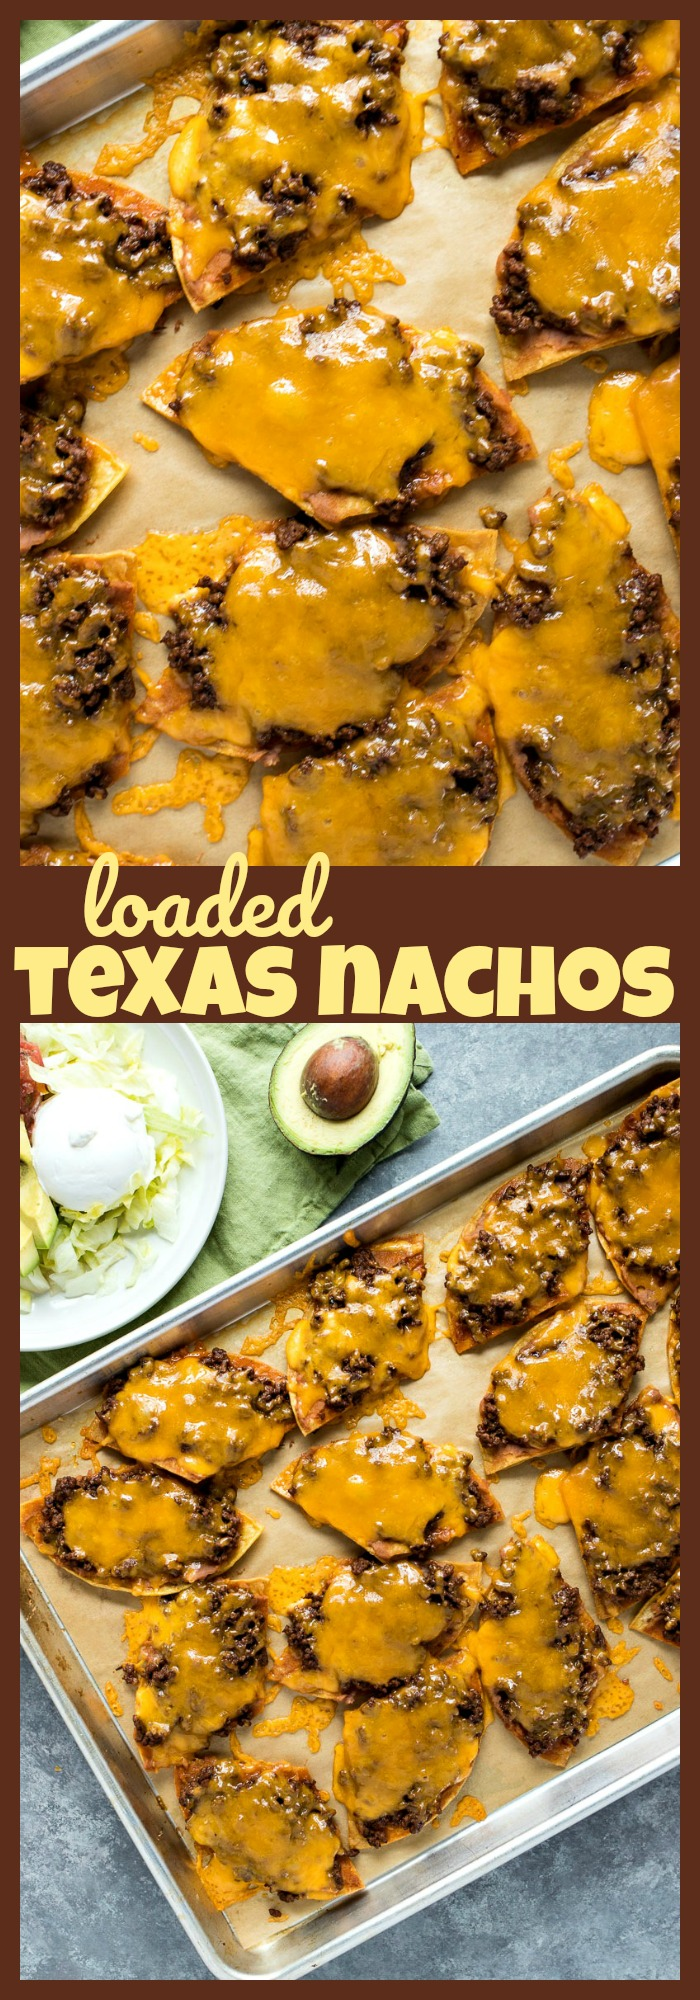 Loaded Texas Nachos photo collage